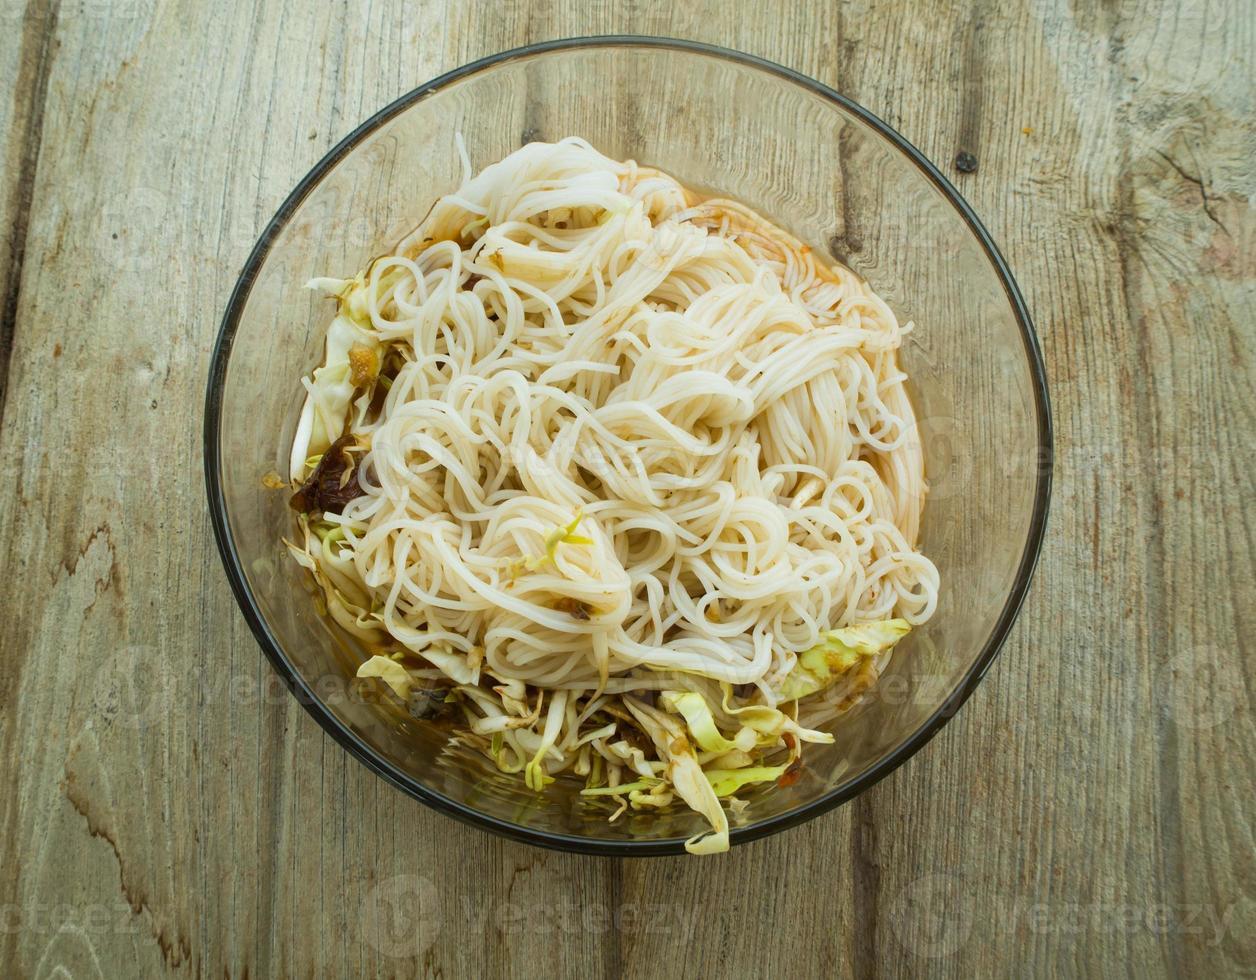 Thaise vermicelli gegeten met curry foto